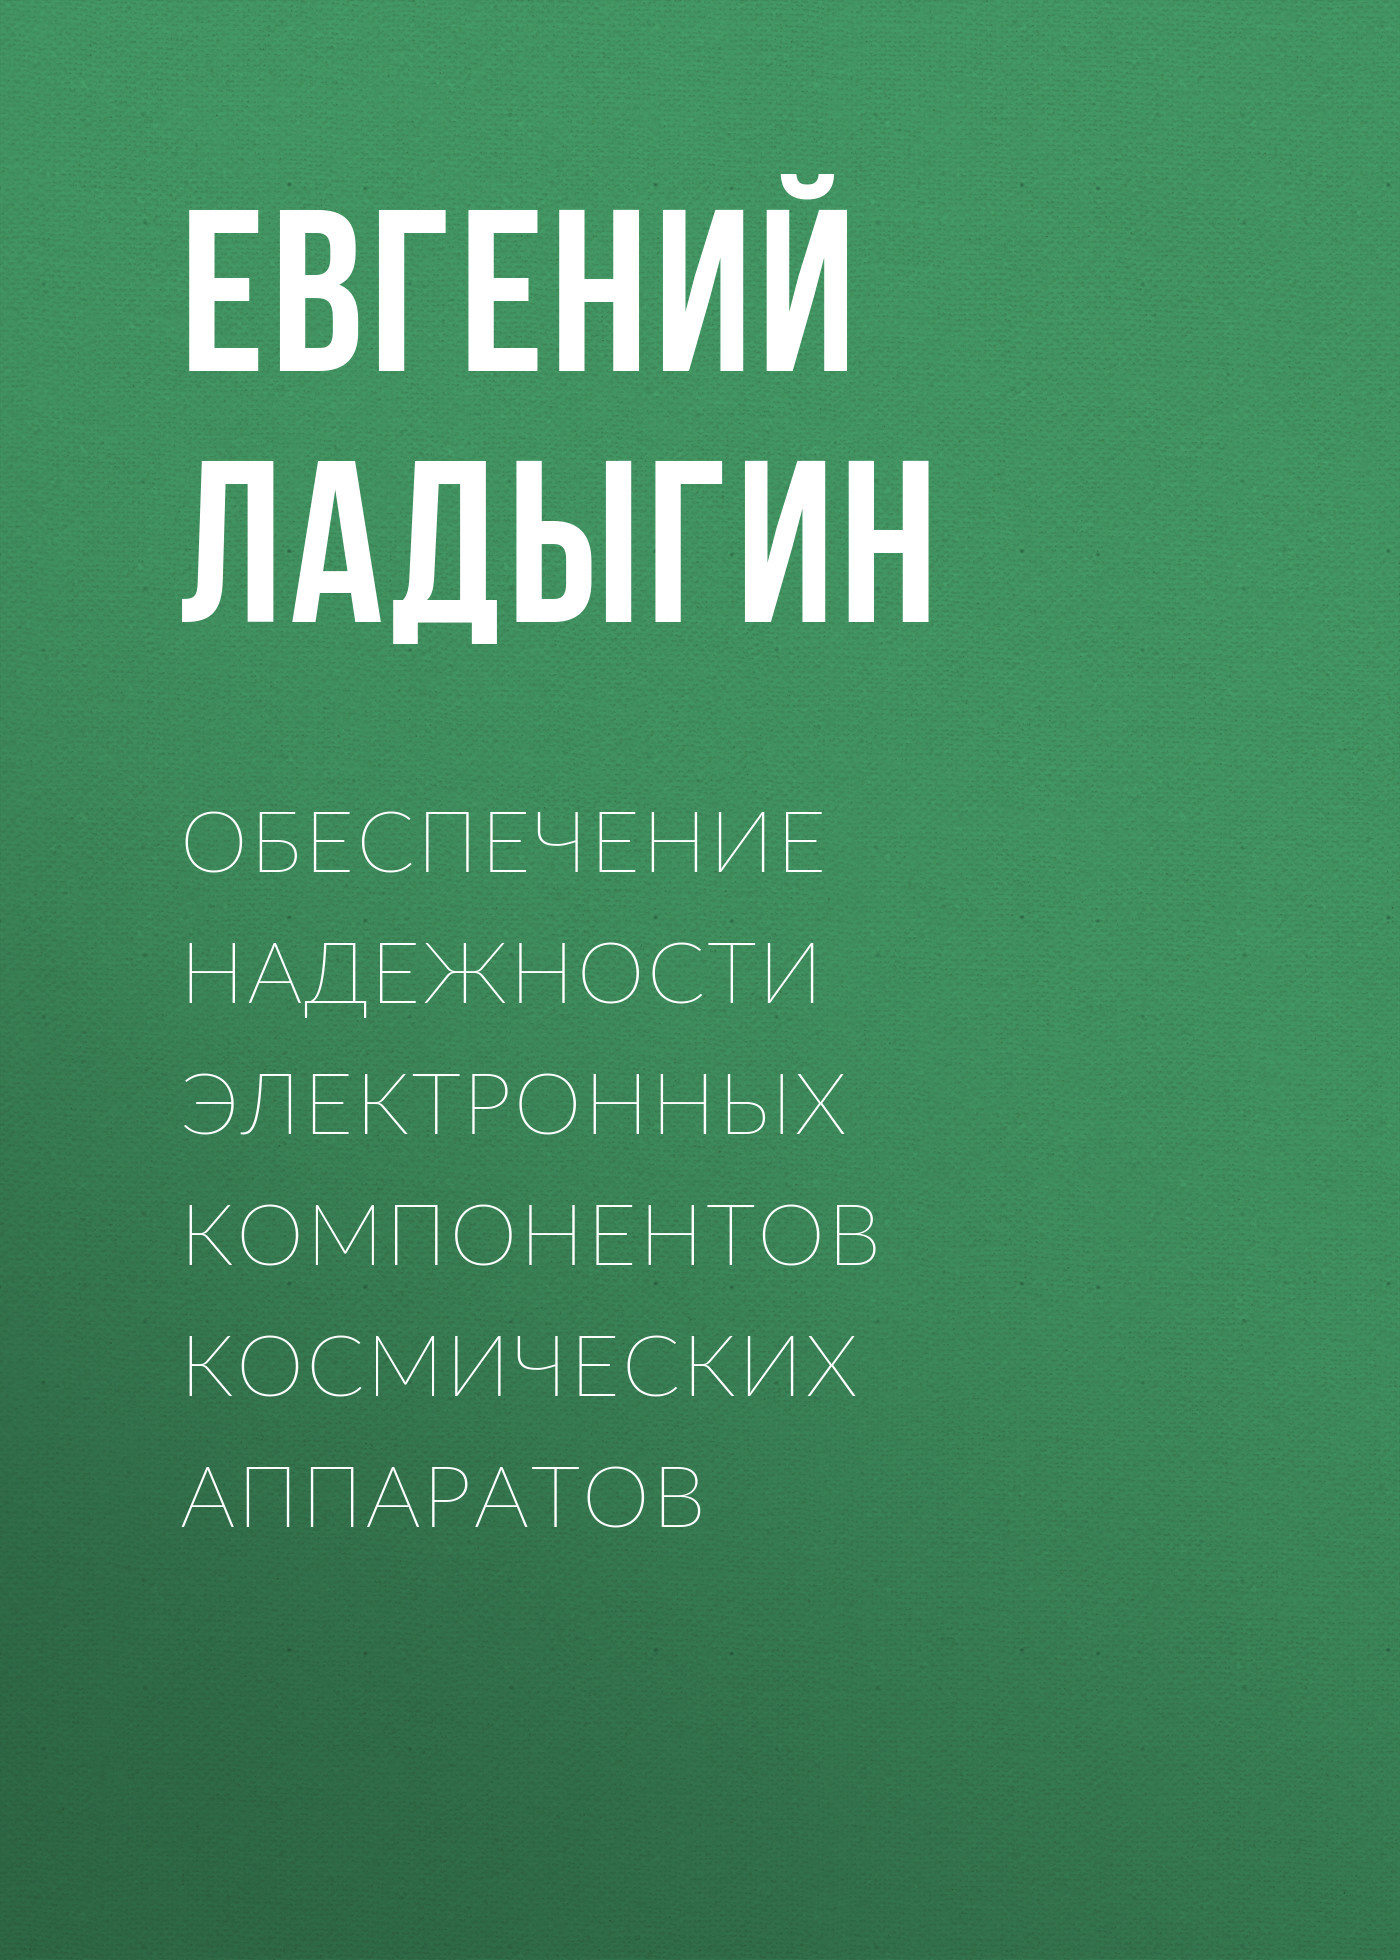 Евгений Ладыгин бесплатно